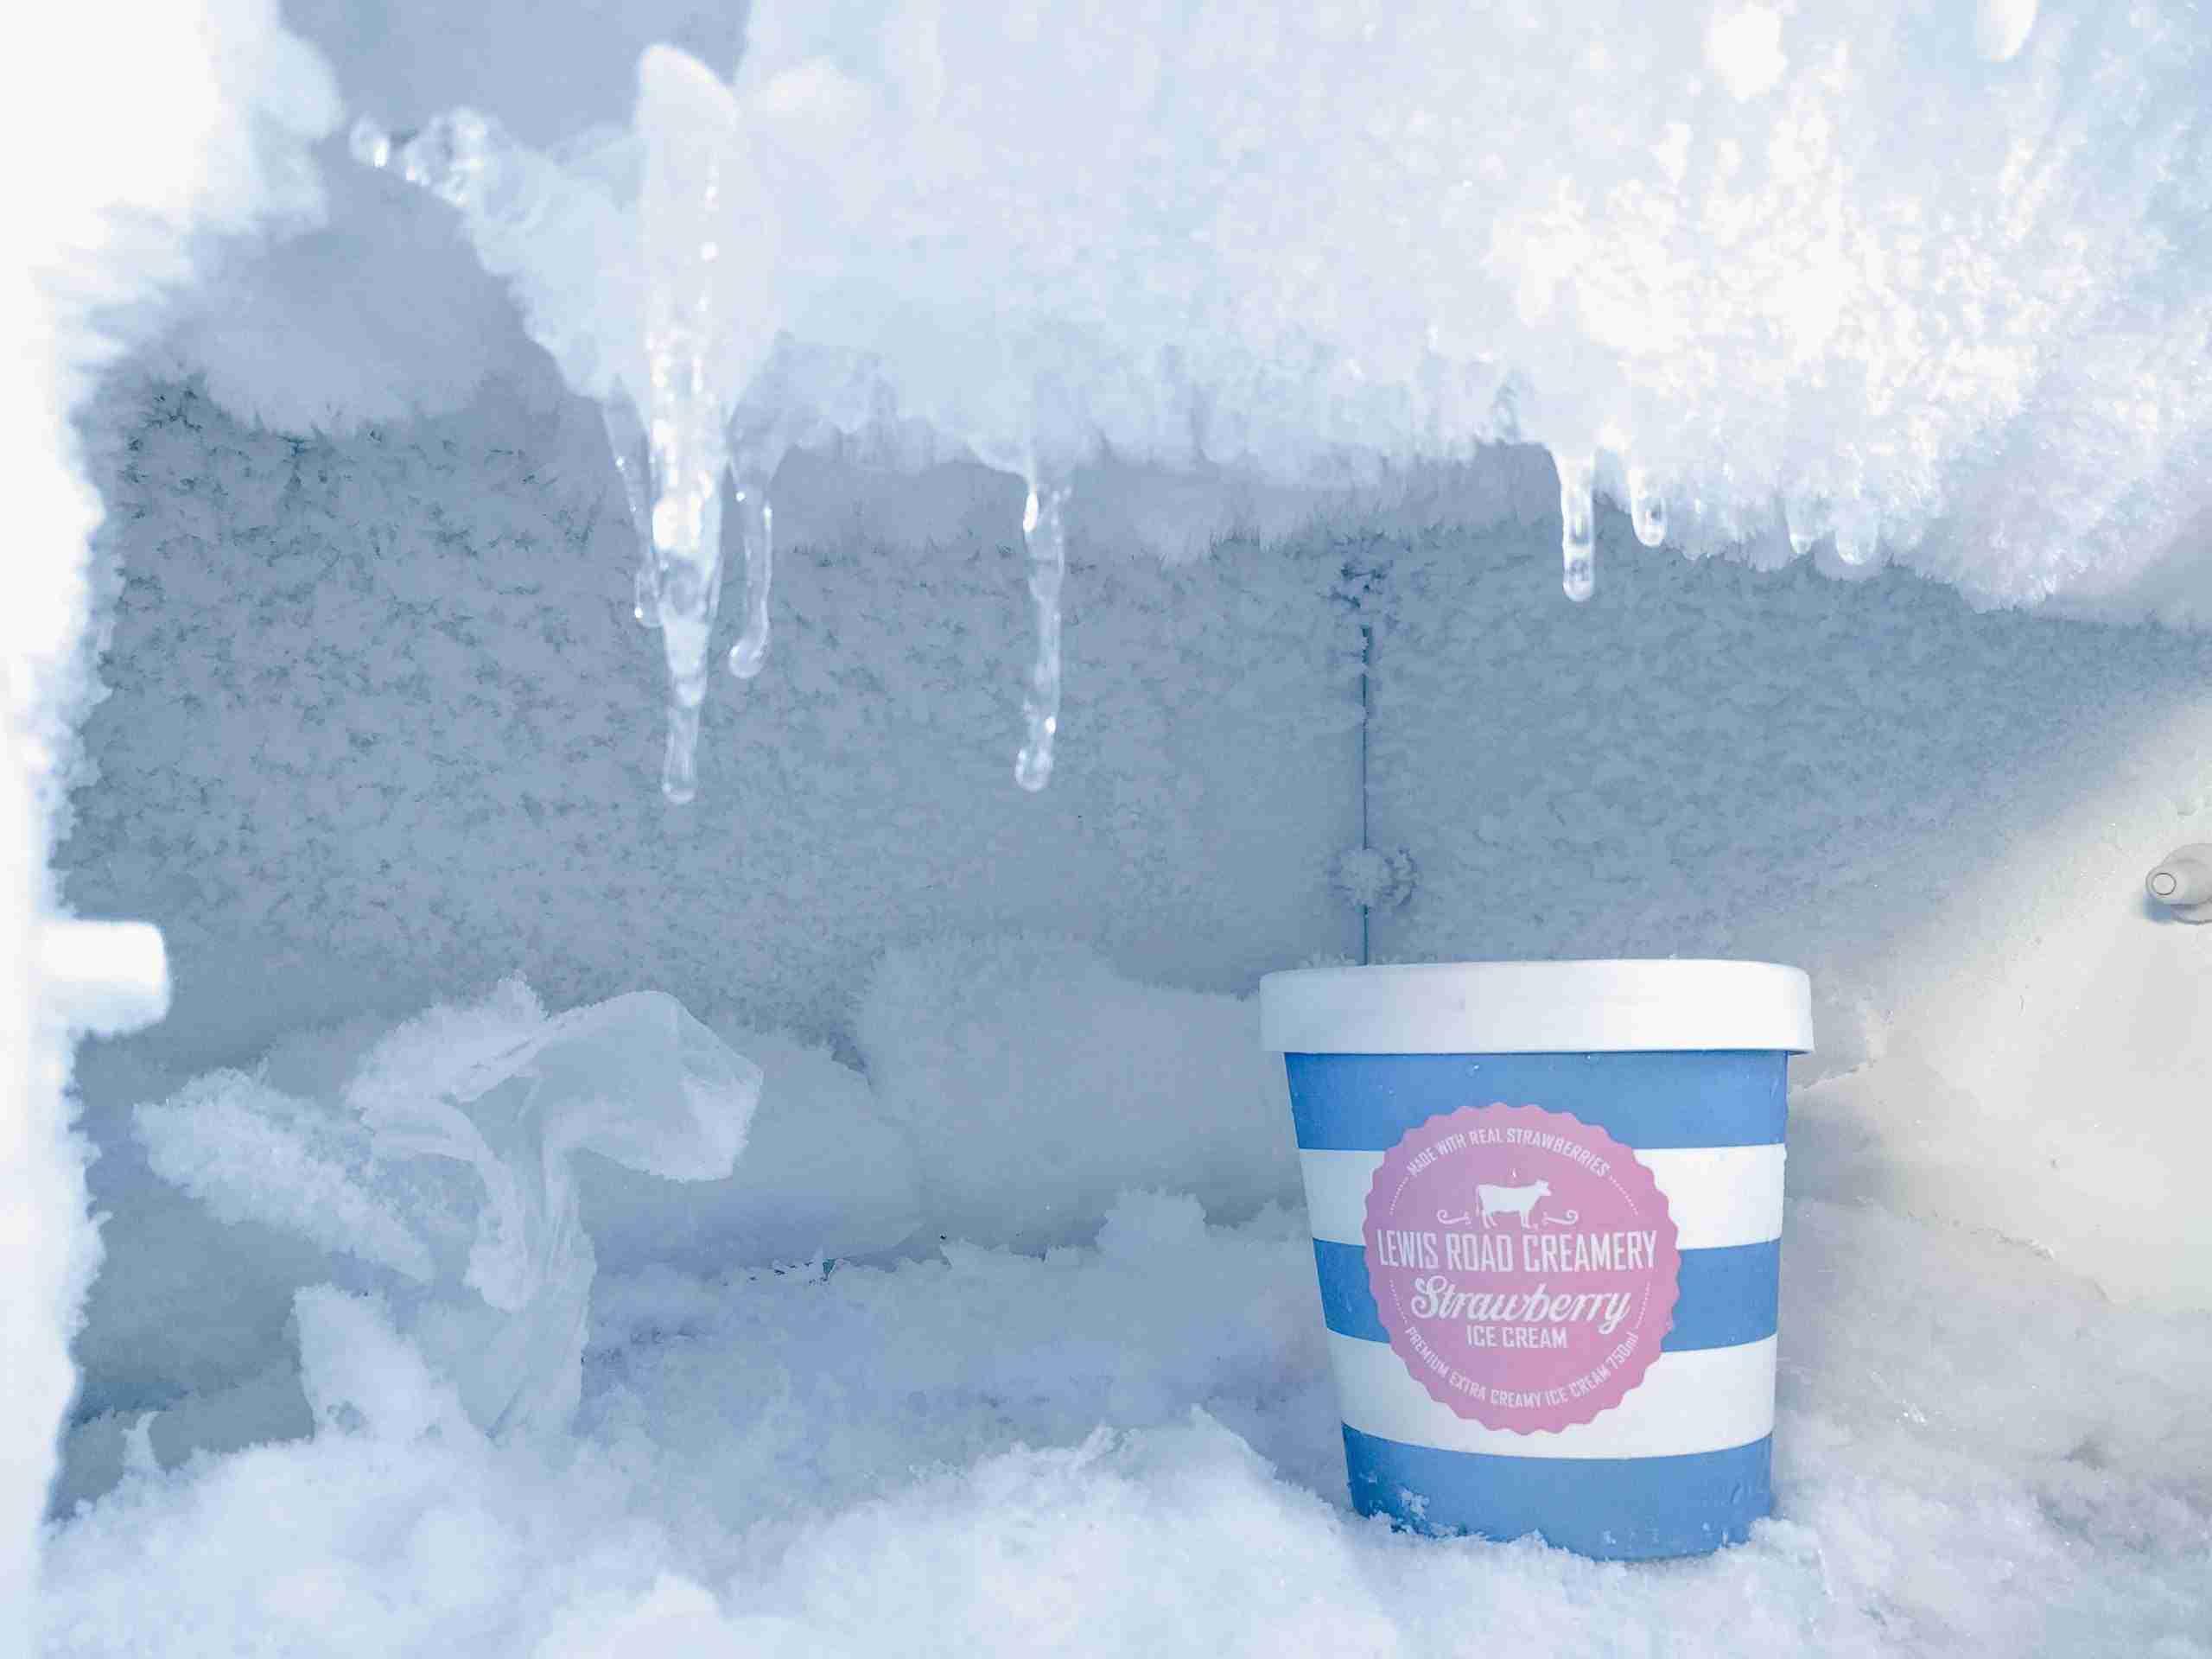 Ice cream in a freezer